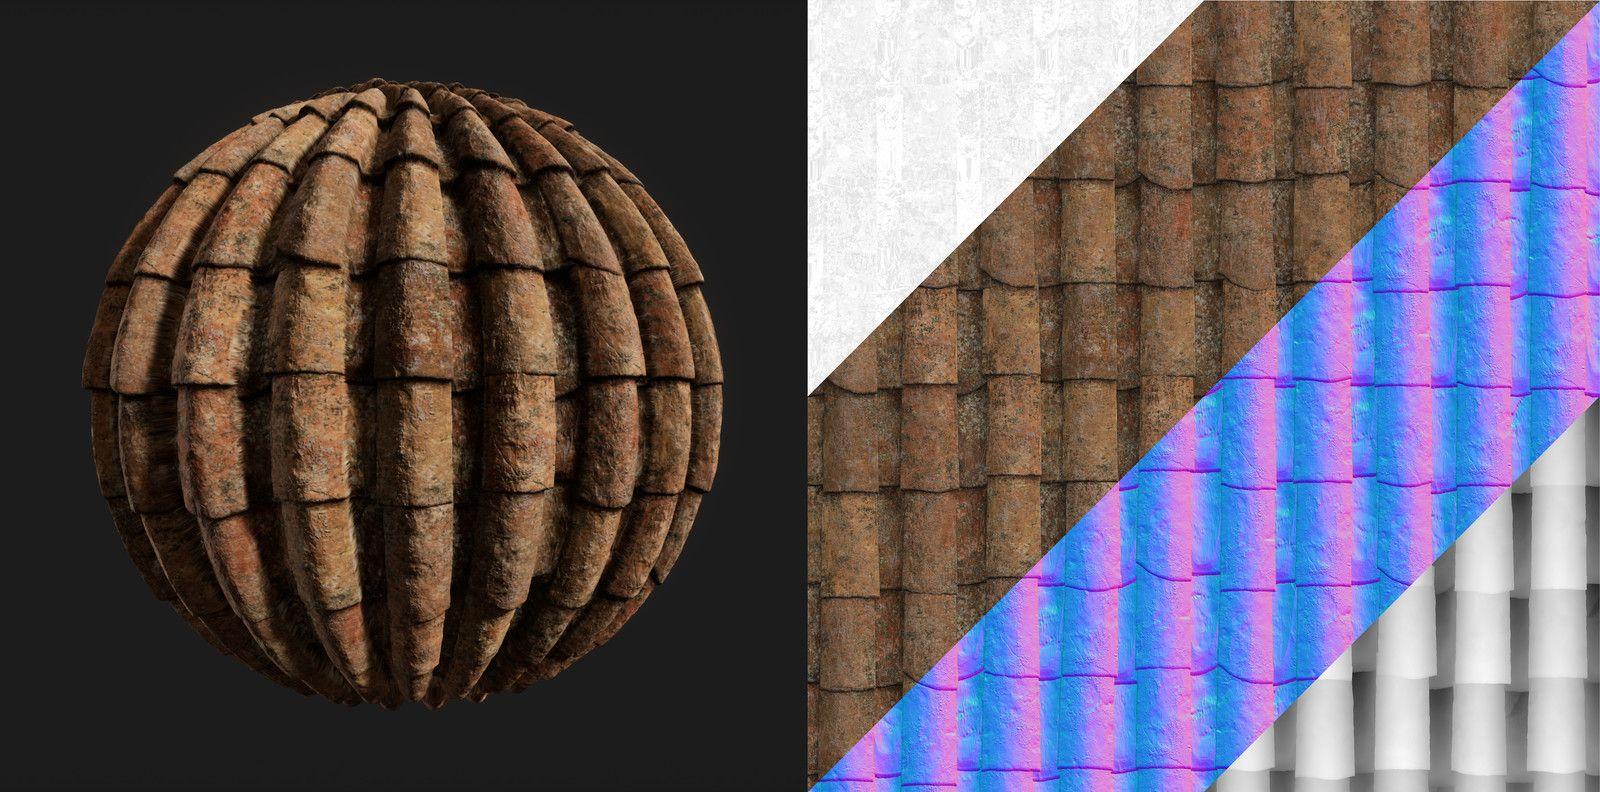 Old Roof Tiles Material, Elias Tsirides on ArtStation at